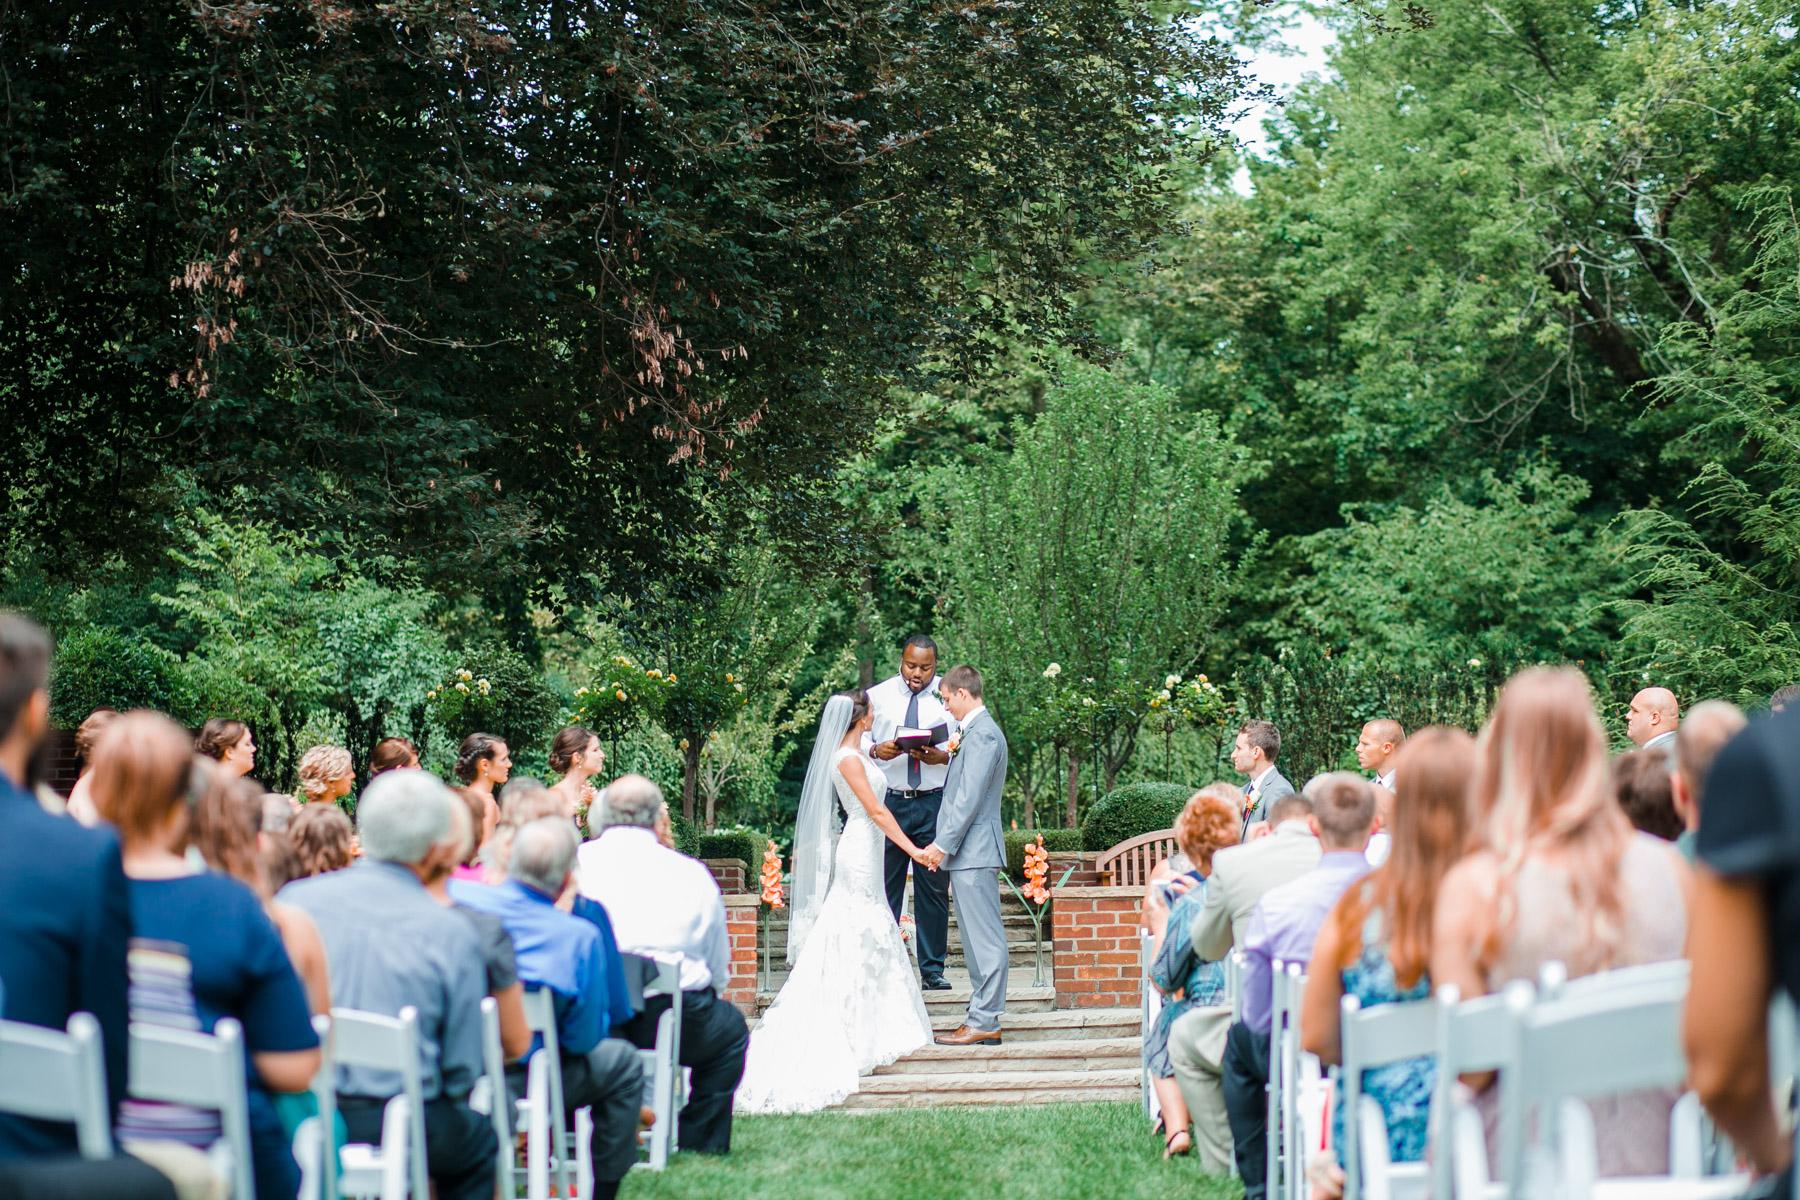 wildwood-park-wedding-photos-43.jpg